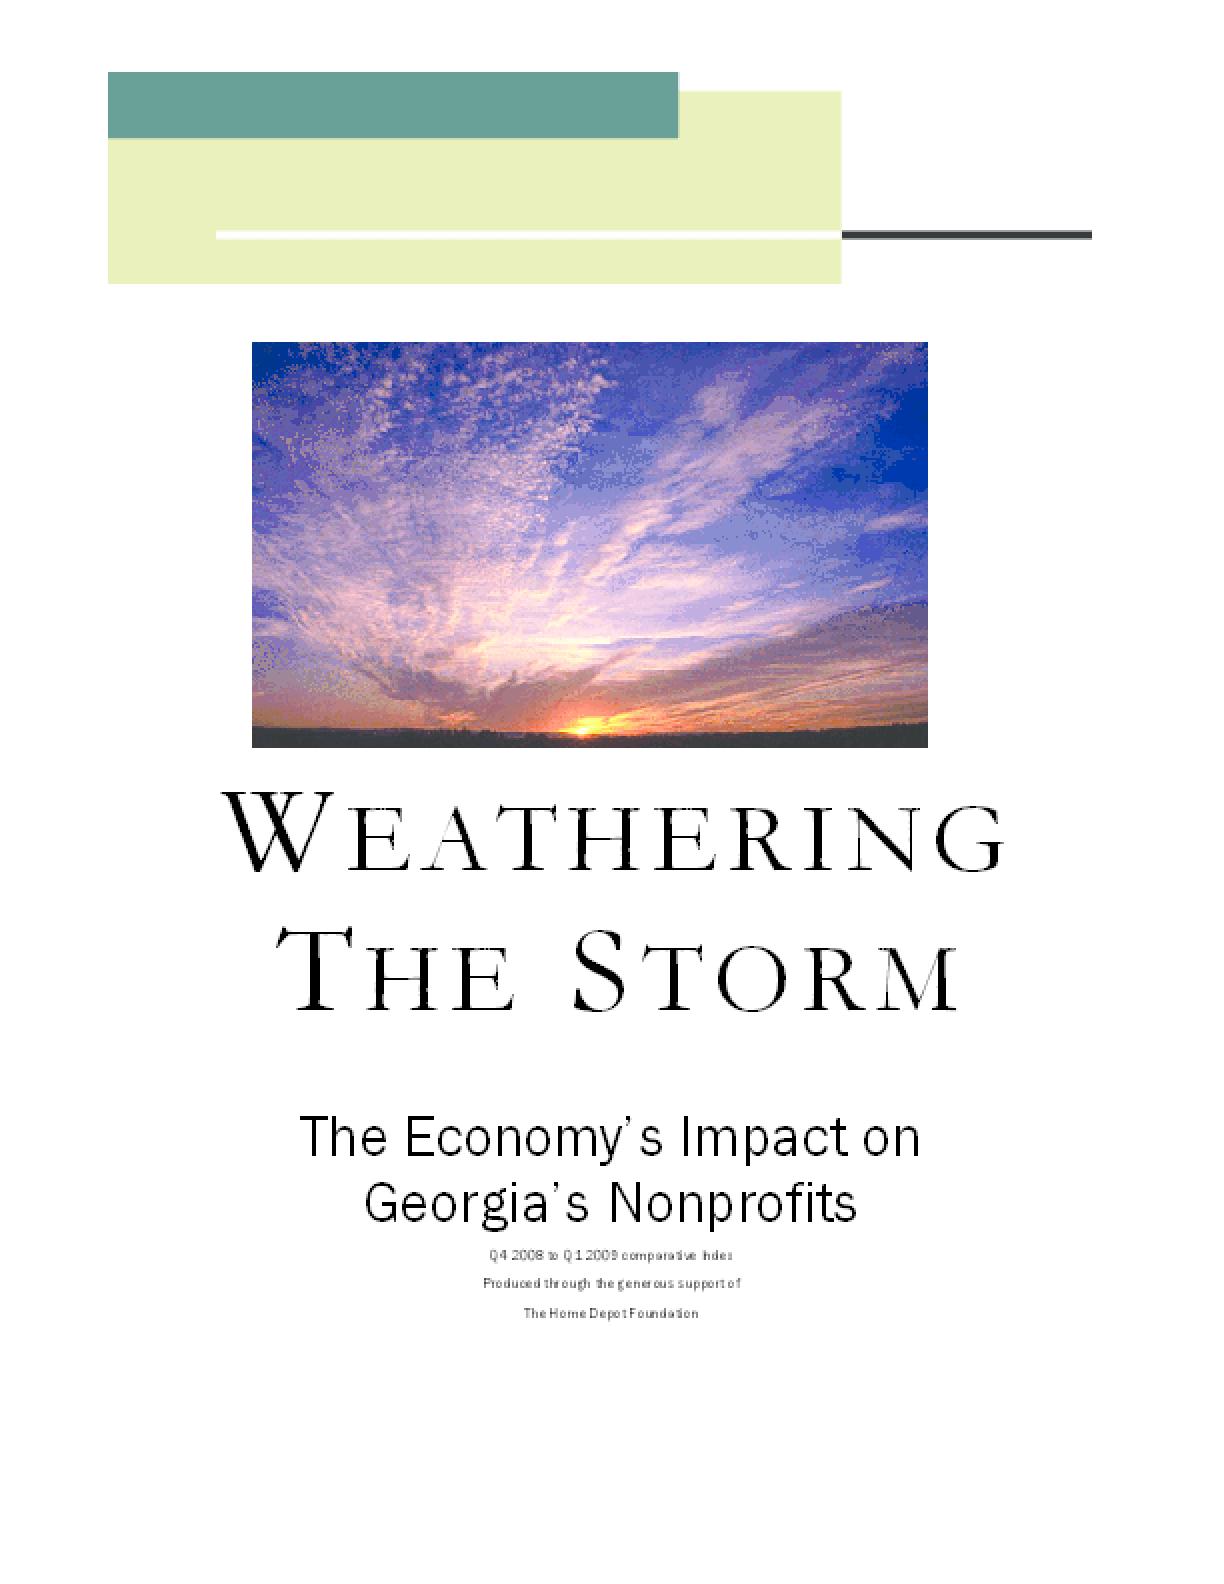 Weathering the Storm: The Economy's Impact on Georgia's Nonprofits, Q4 2008 to Q1 2009 Comparative Index